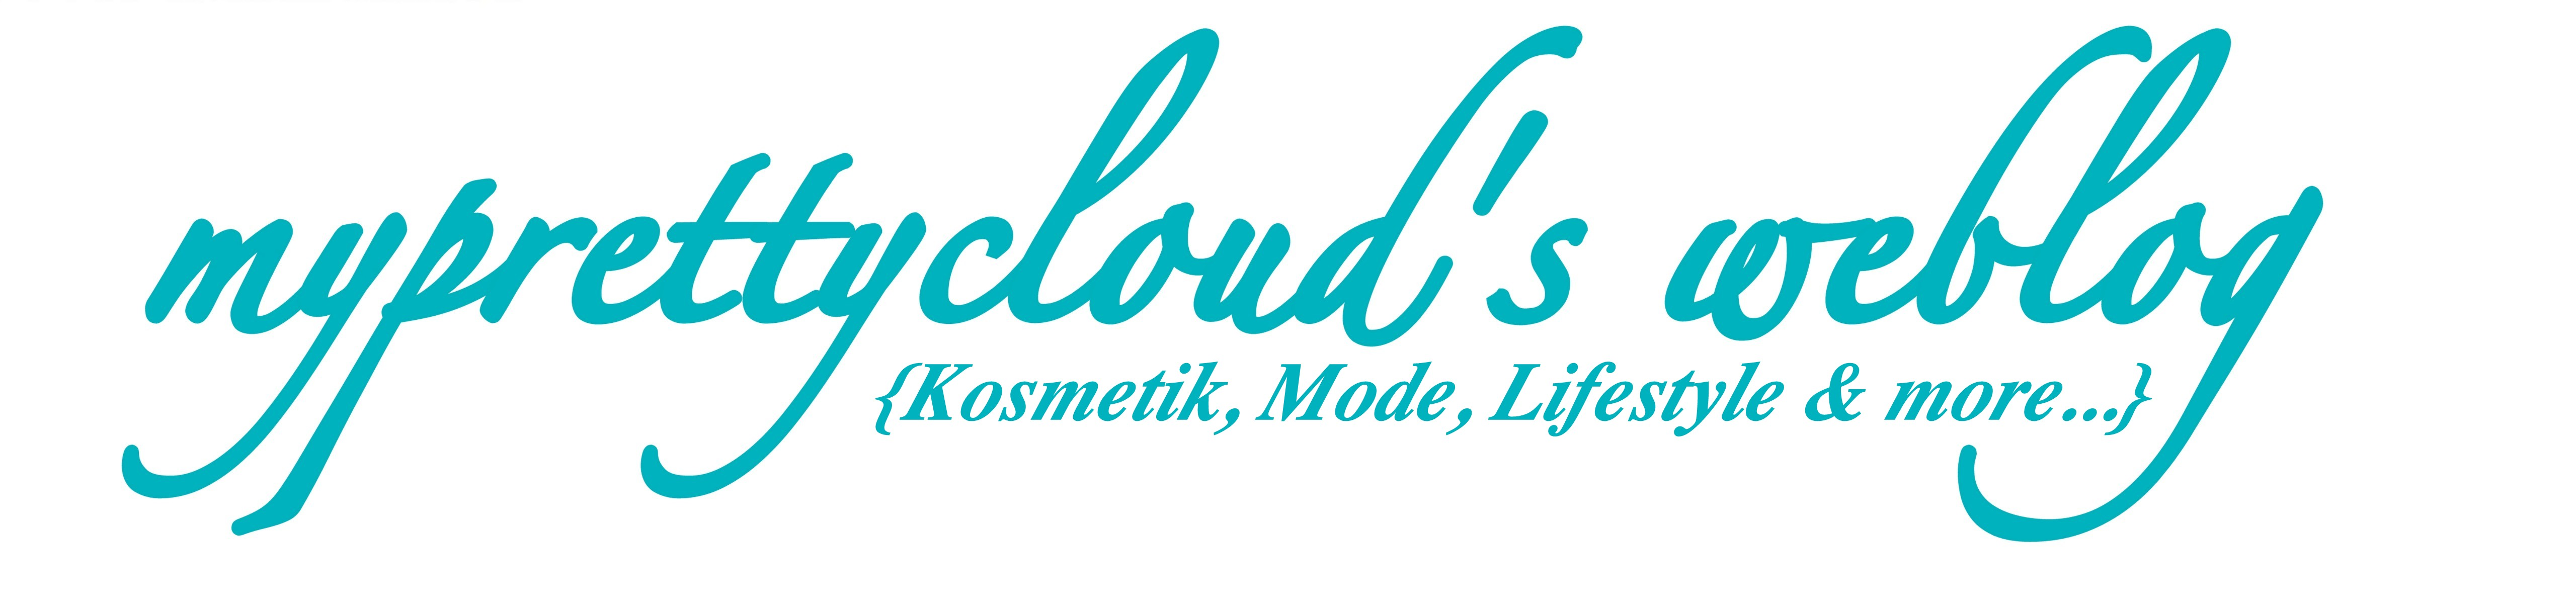 myprettycloud's weblog